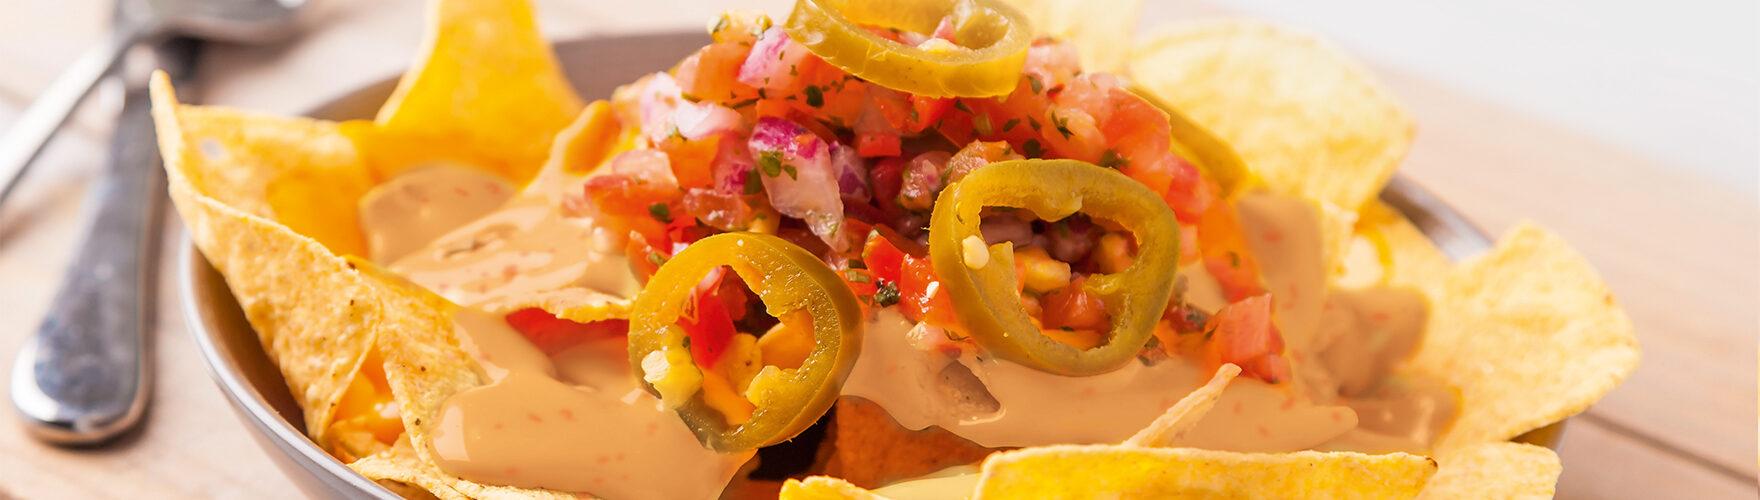 Tortilla nachos with tomato, onion and sambal